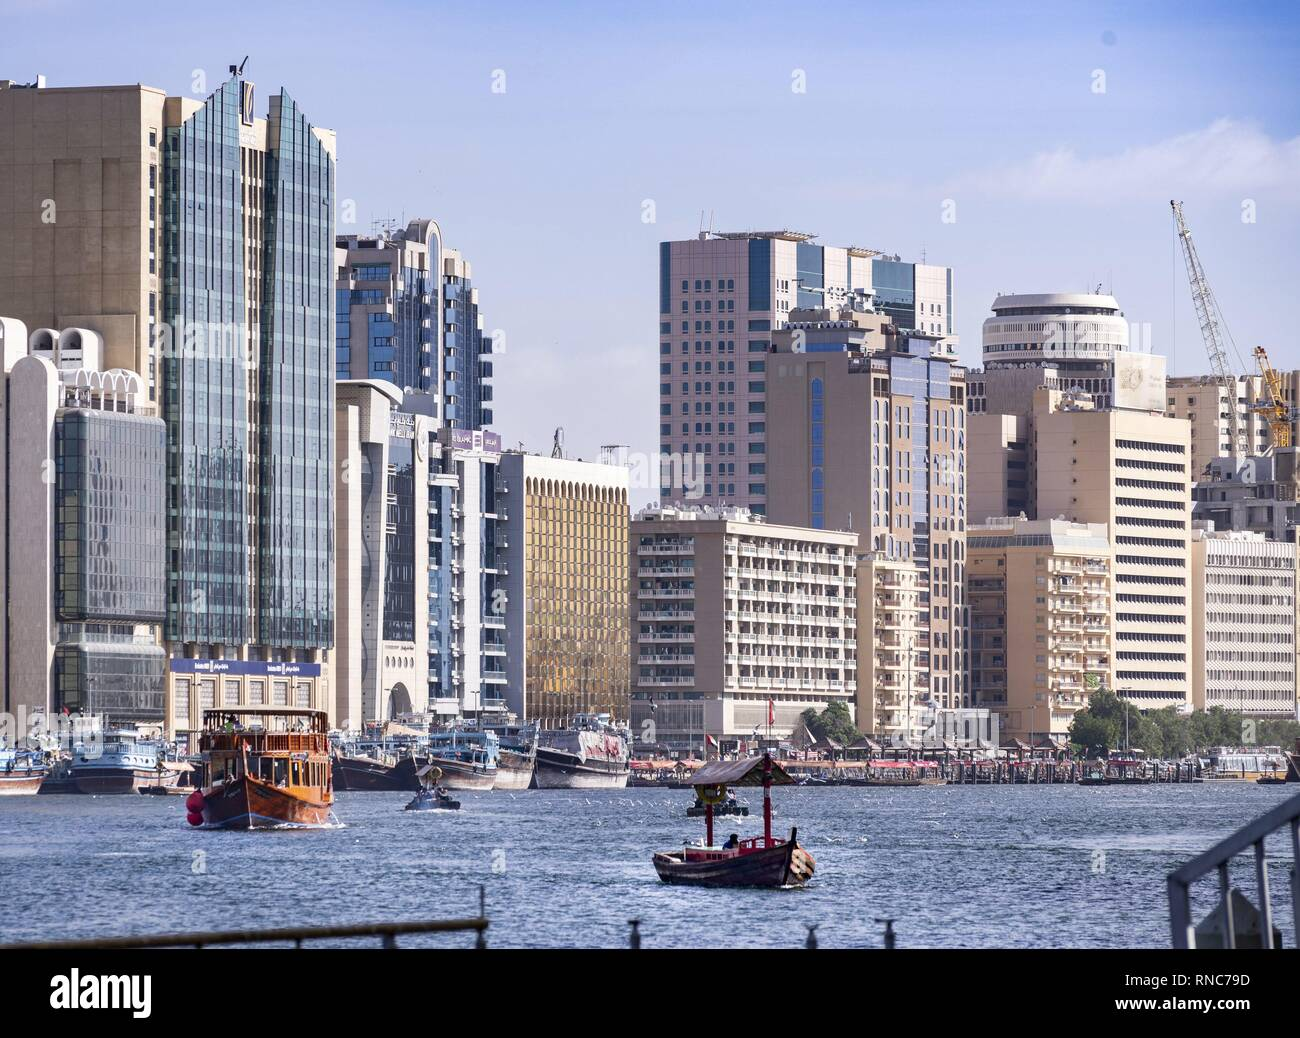 Dubai Today Stock Photos & Dubai Today Stock Images - Alamy